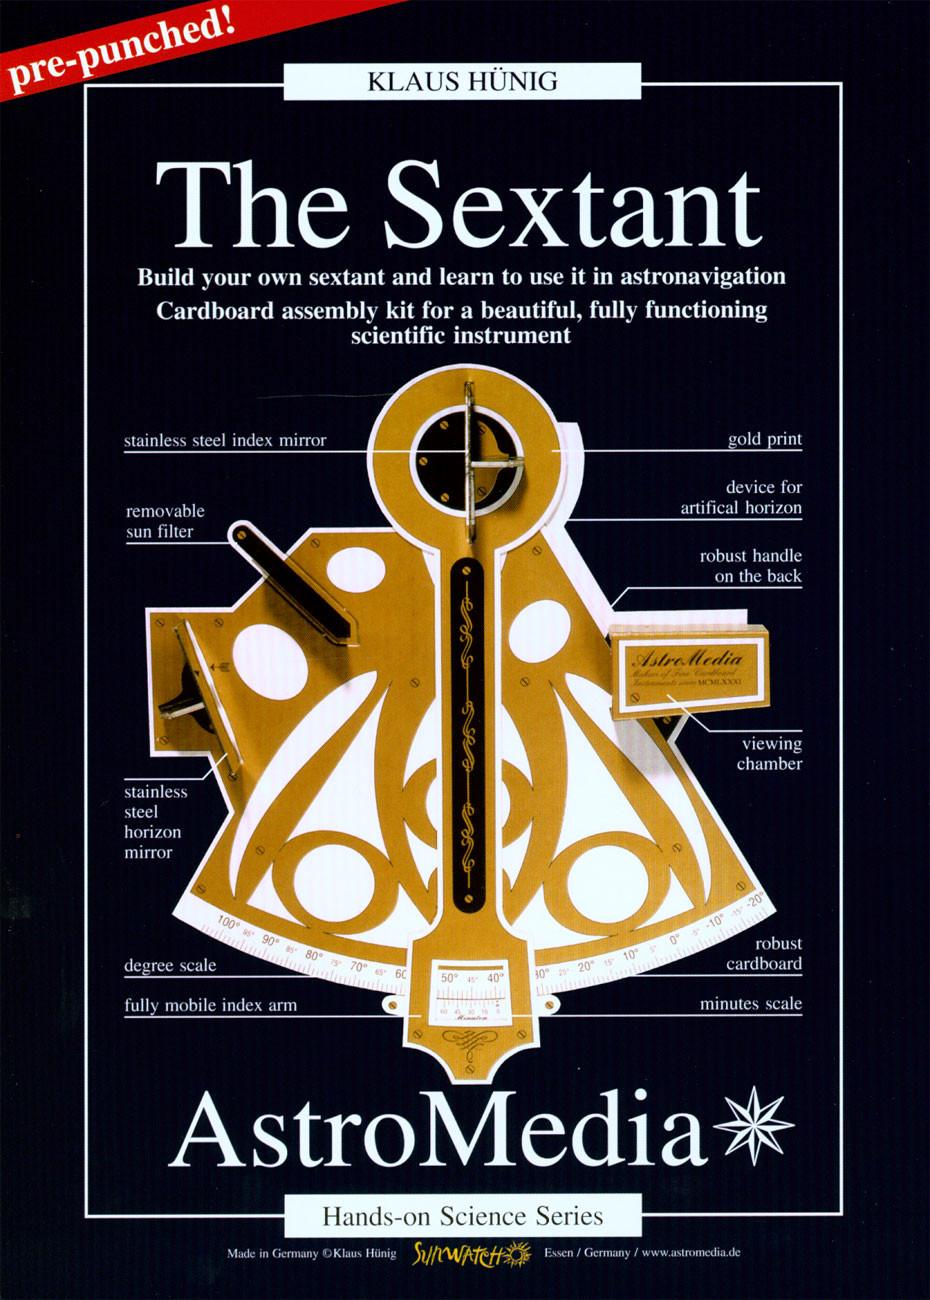 Cardboard Sextant Kit